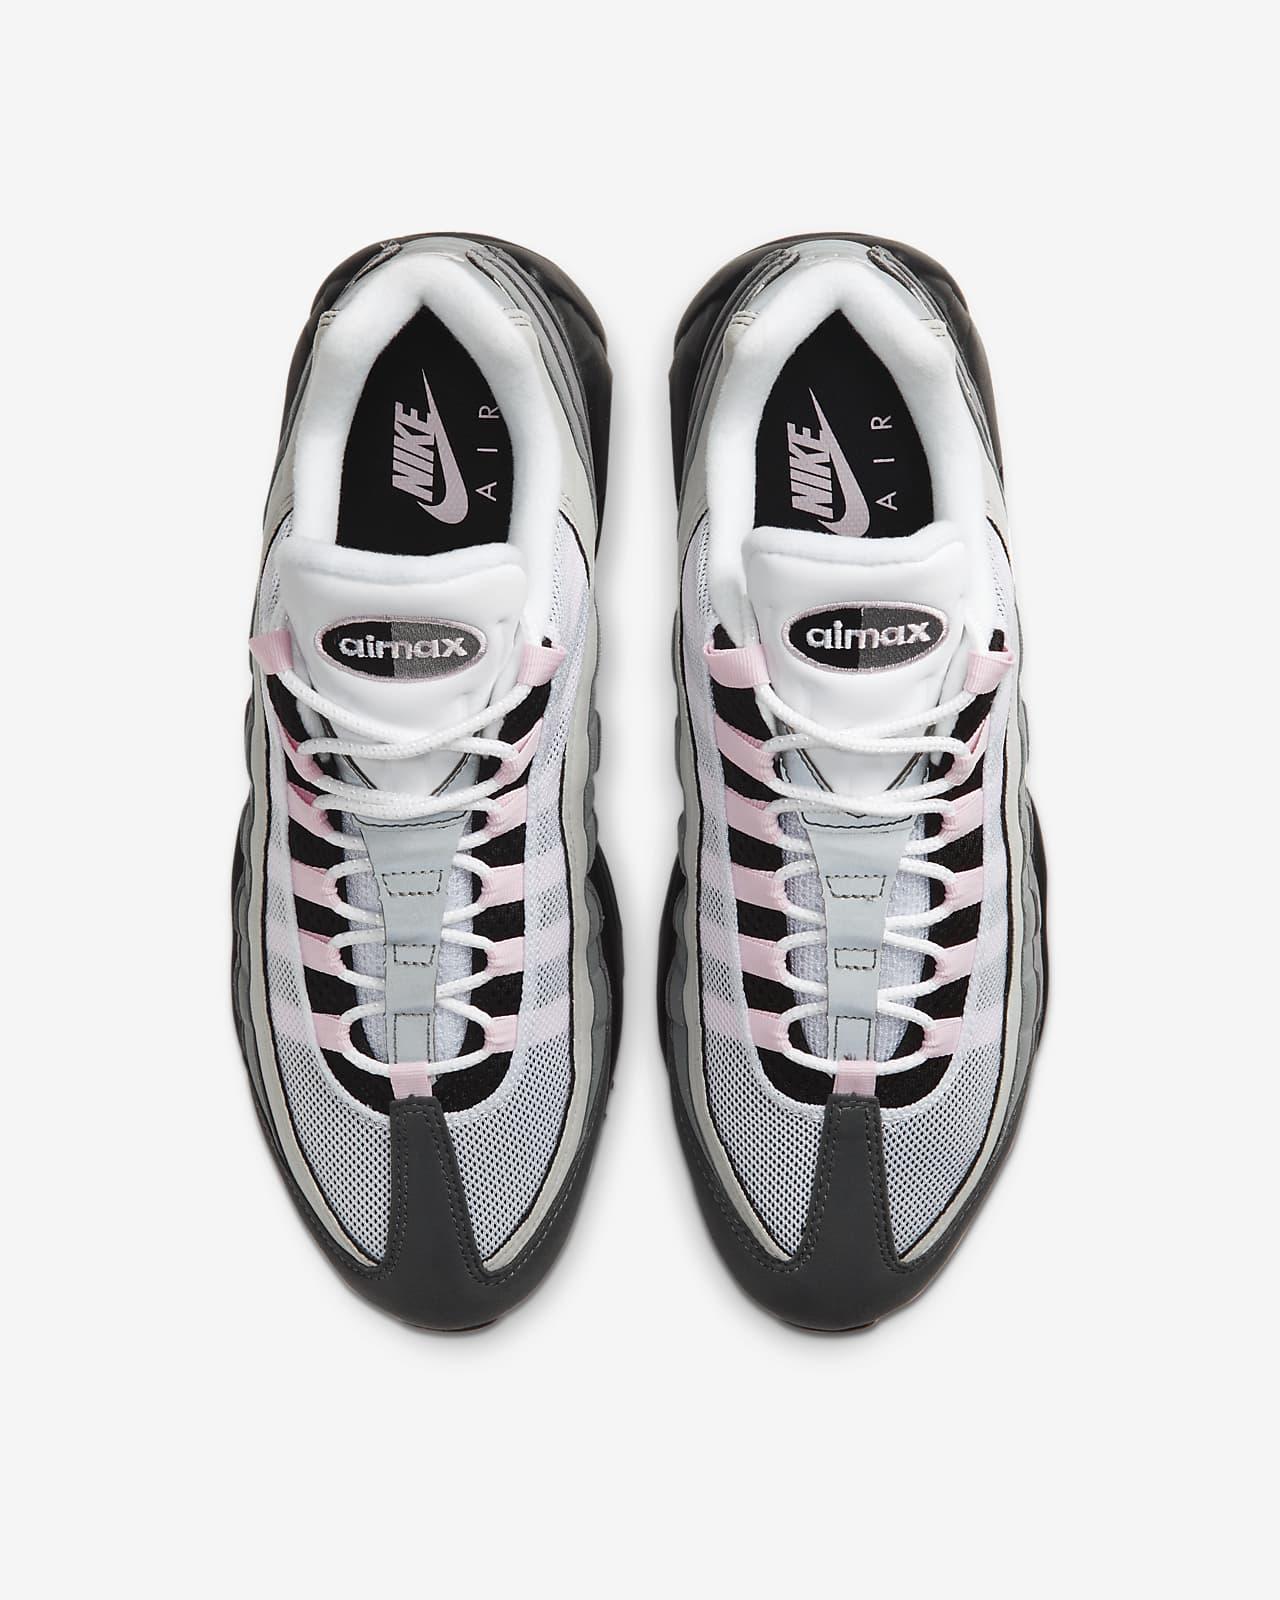 air max 95 pink foam on feet